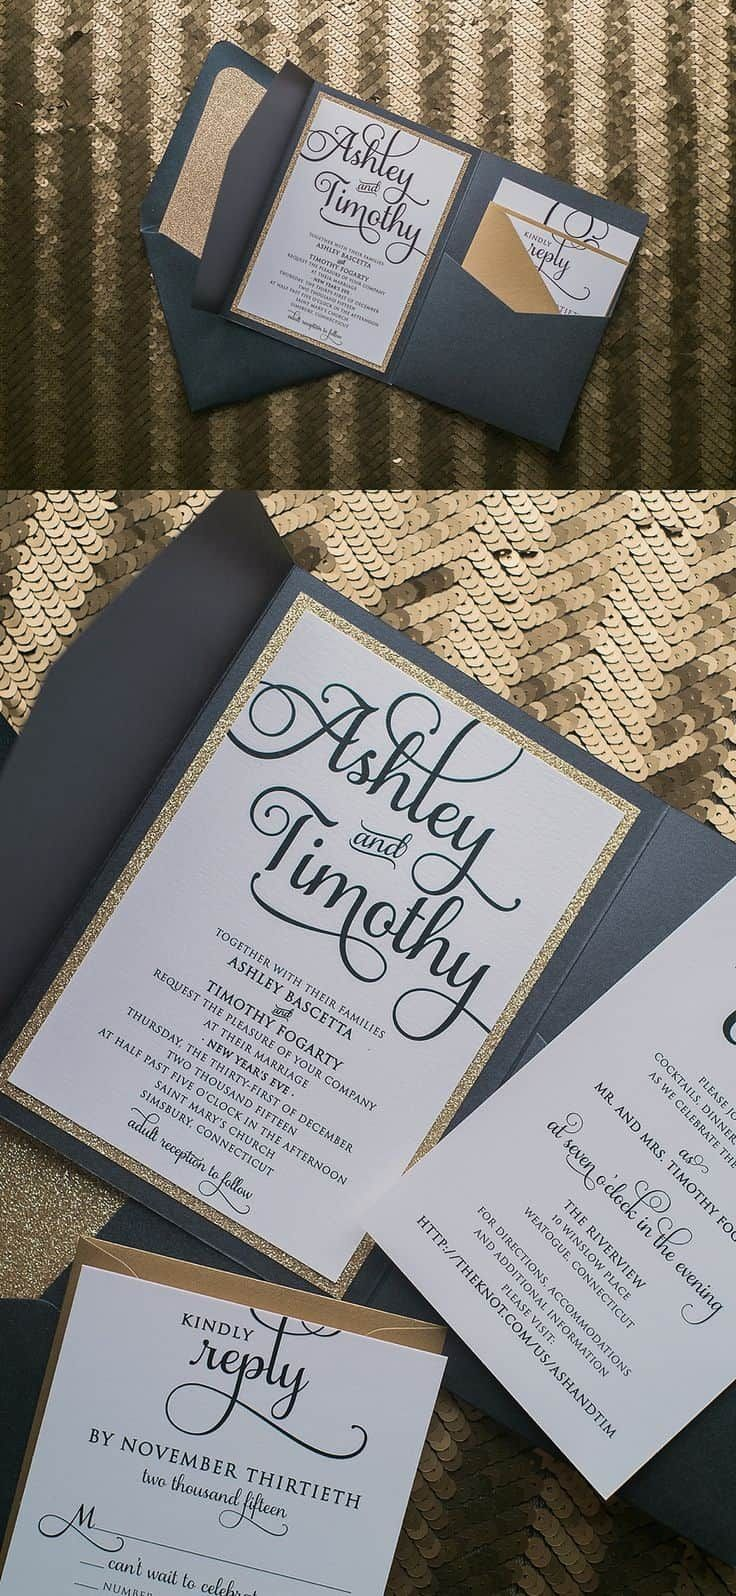 Unique Ideas For Wedding Invitations Near Me Ideas Alluring Layout The Egreetingec Kata Kata Undangan Pernikahan Undangan Pernikahan Mewah Kartu Pernikahan